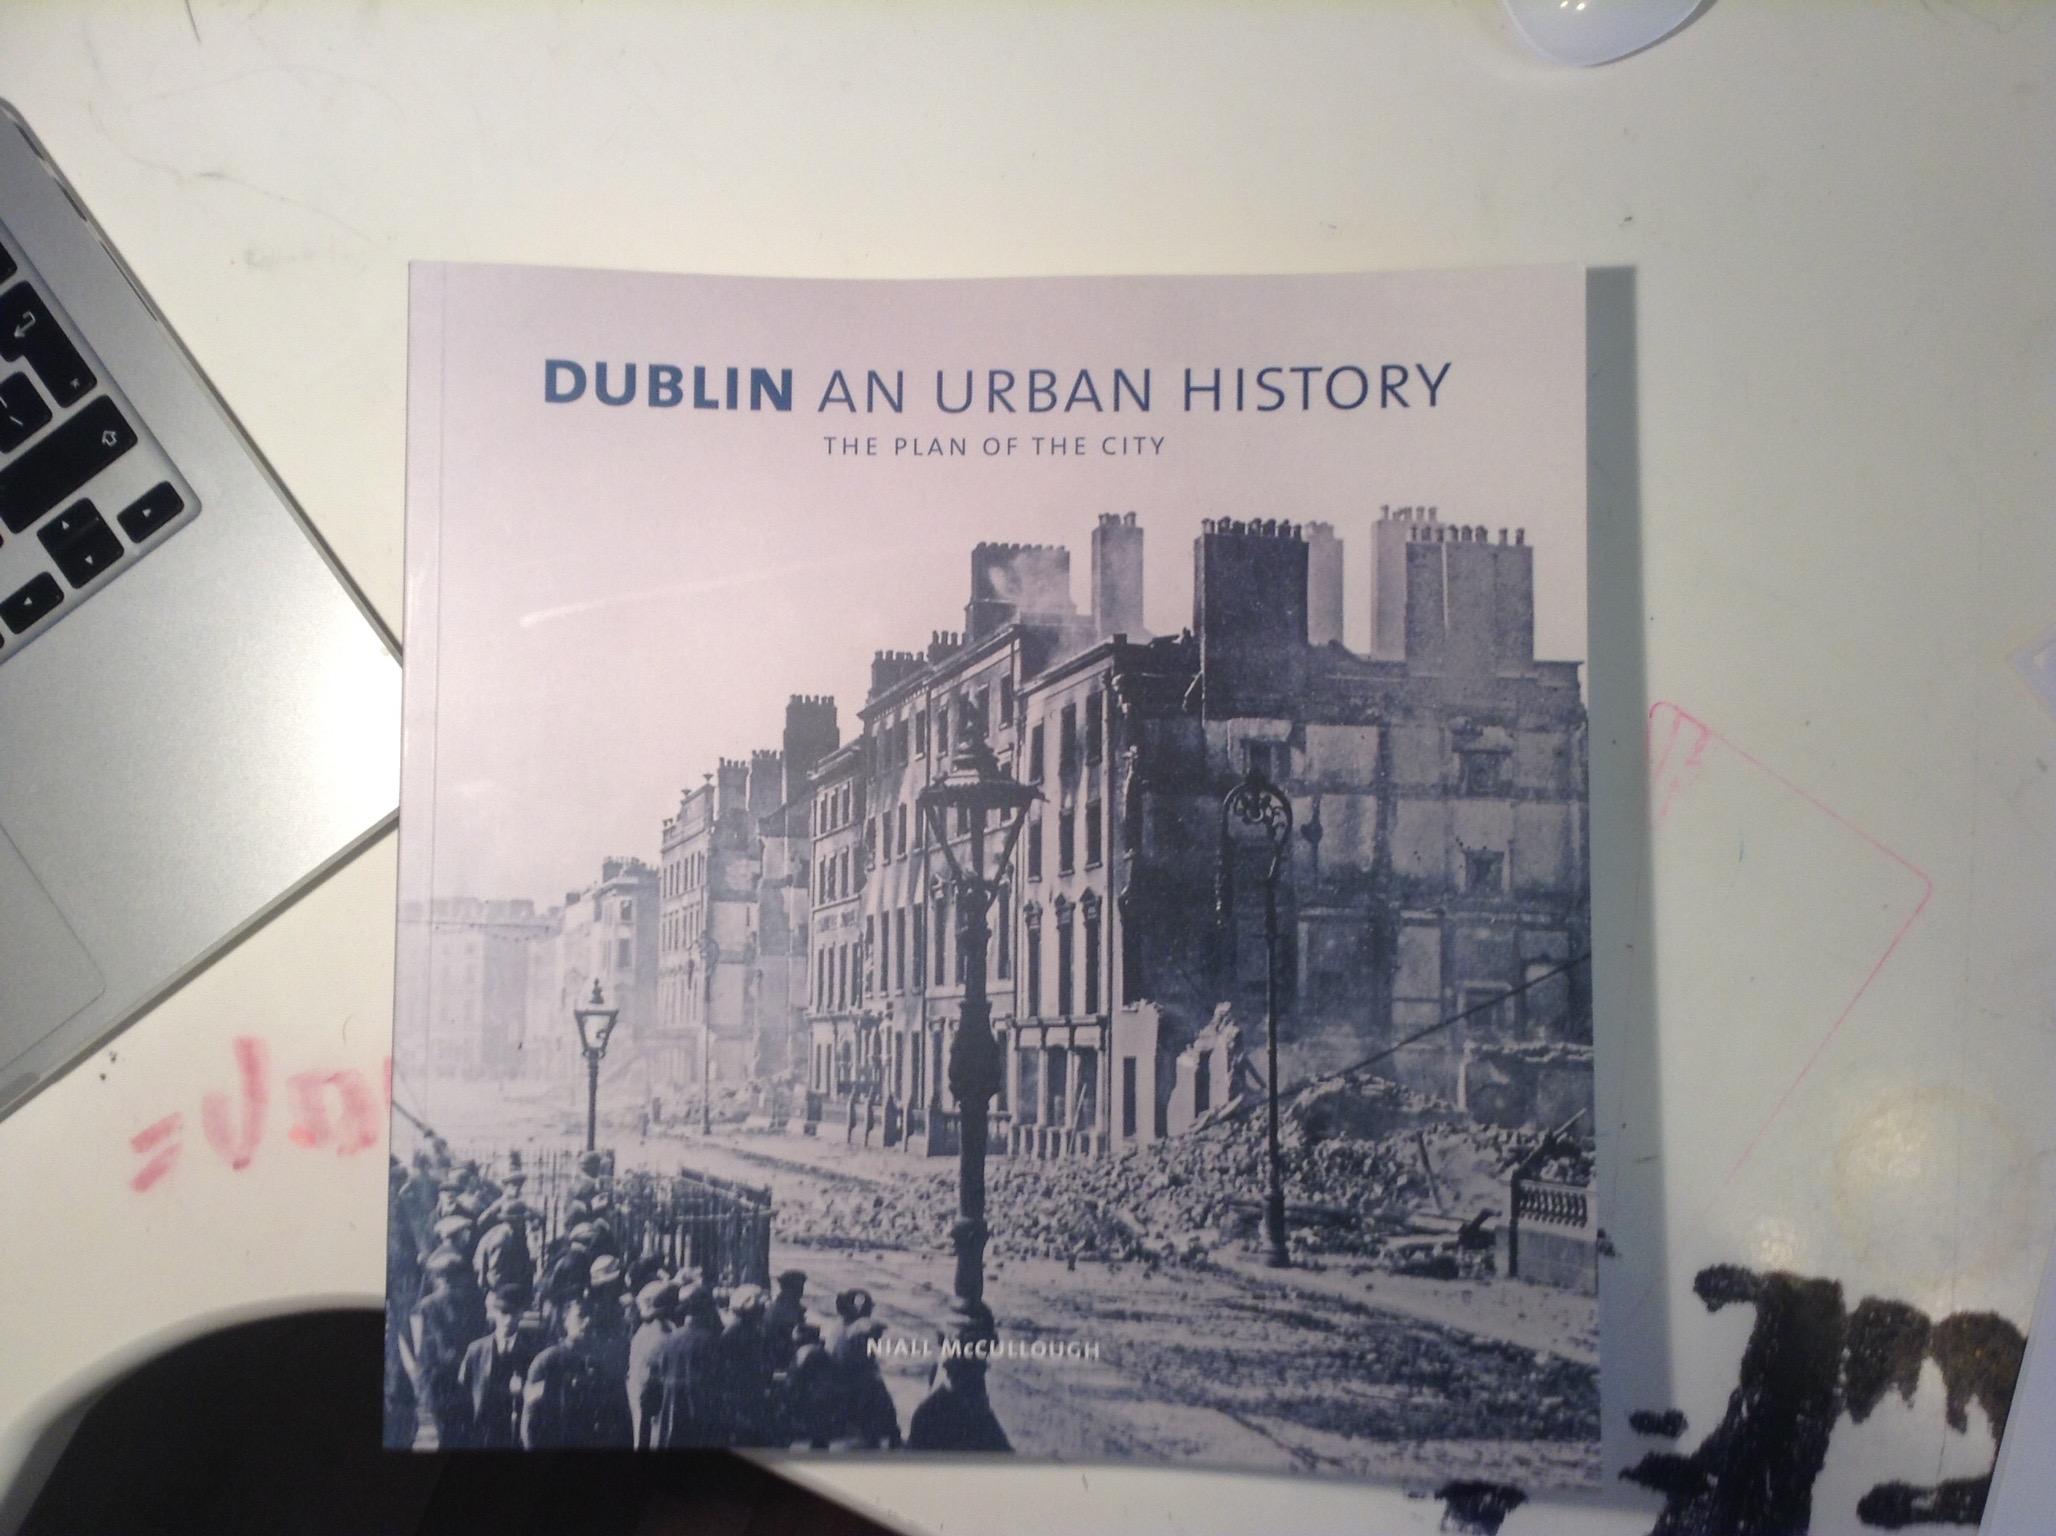 Dublin An Urban History